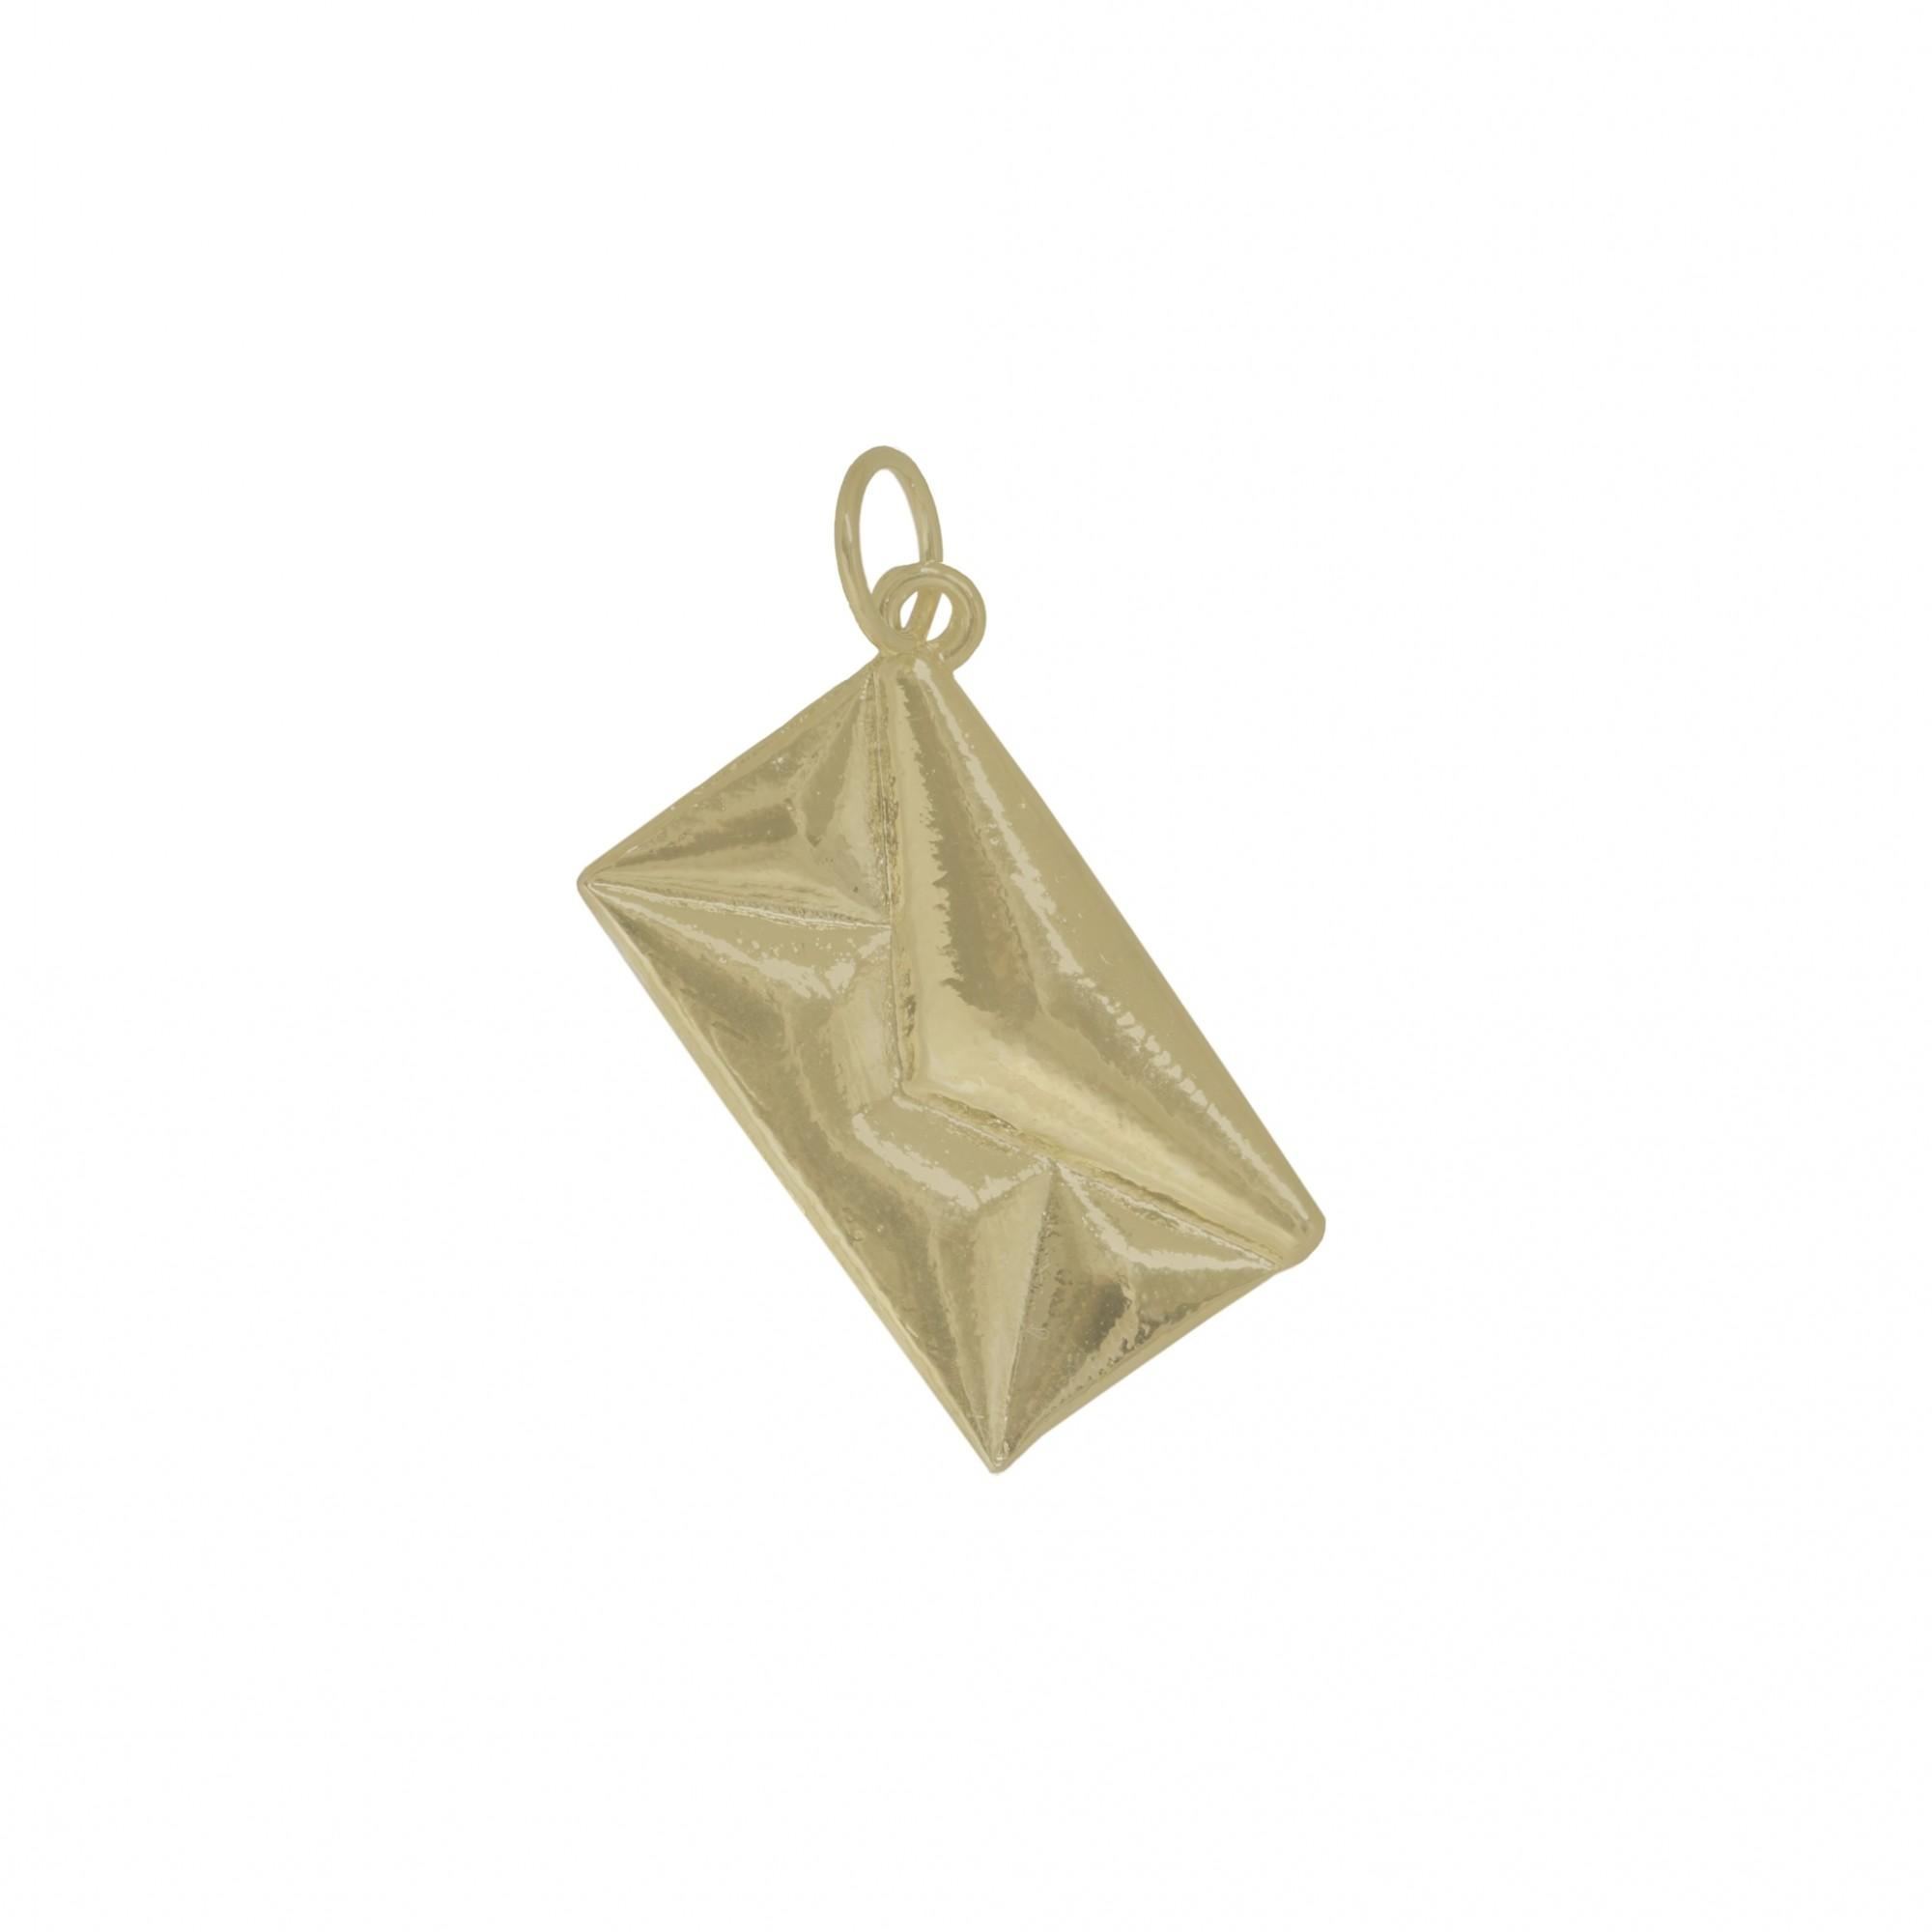 Pingente semijoia carta lisa folheado ouro 18k ou ródio